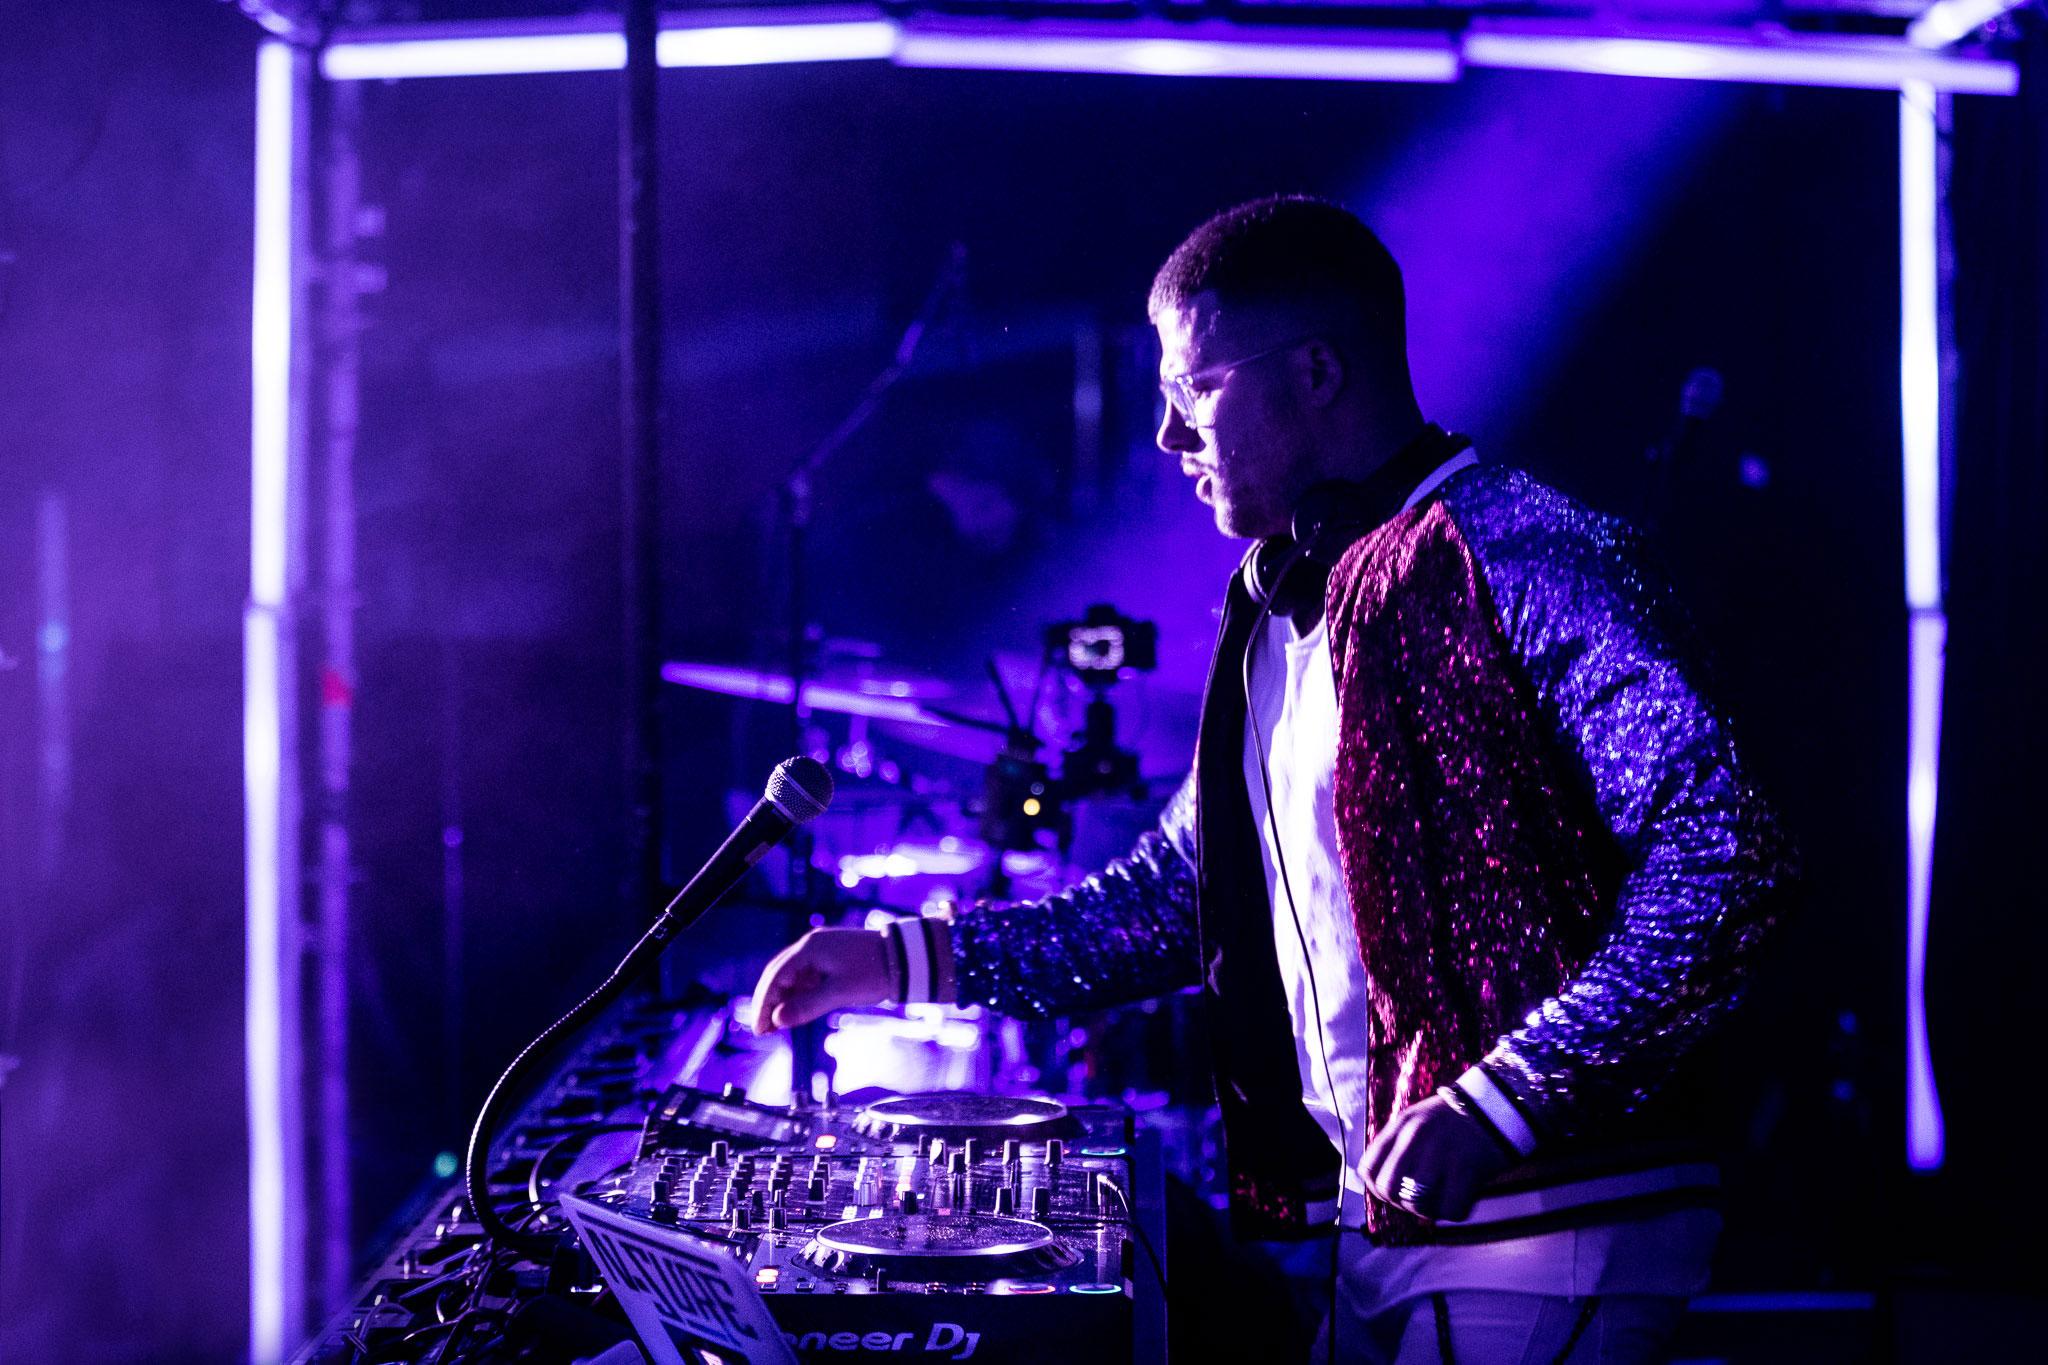 FRESH_MUSIC_LIVE_DJ_NSURE_04